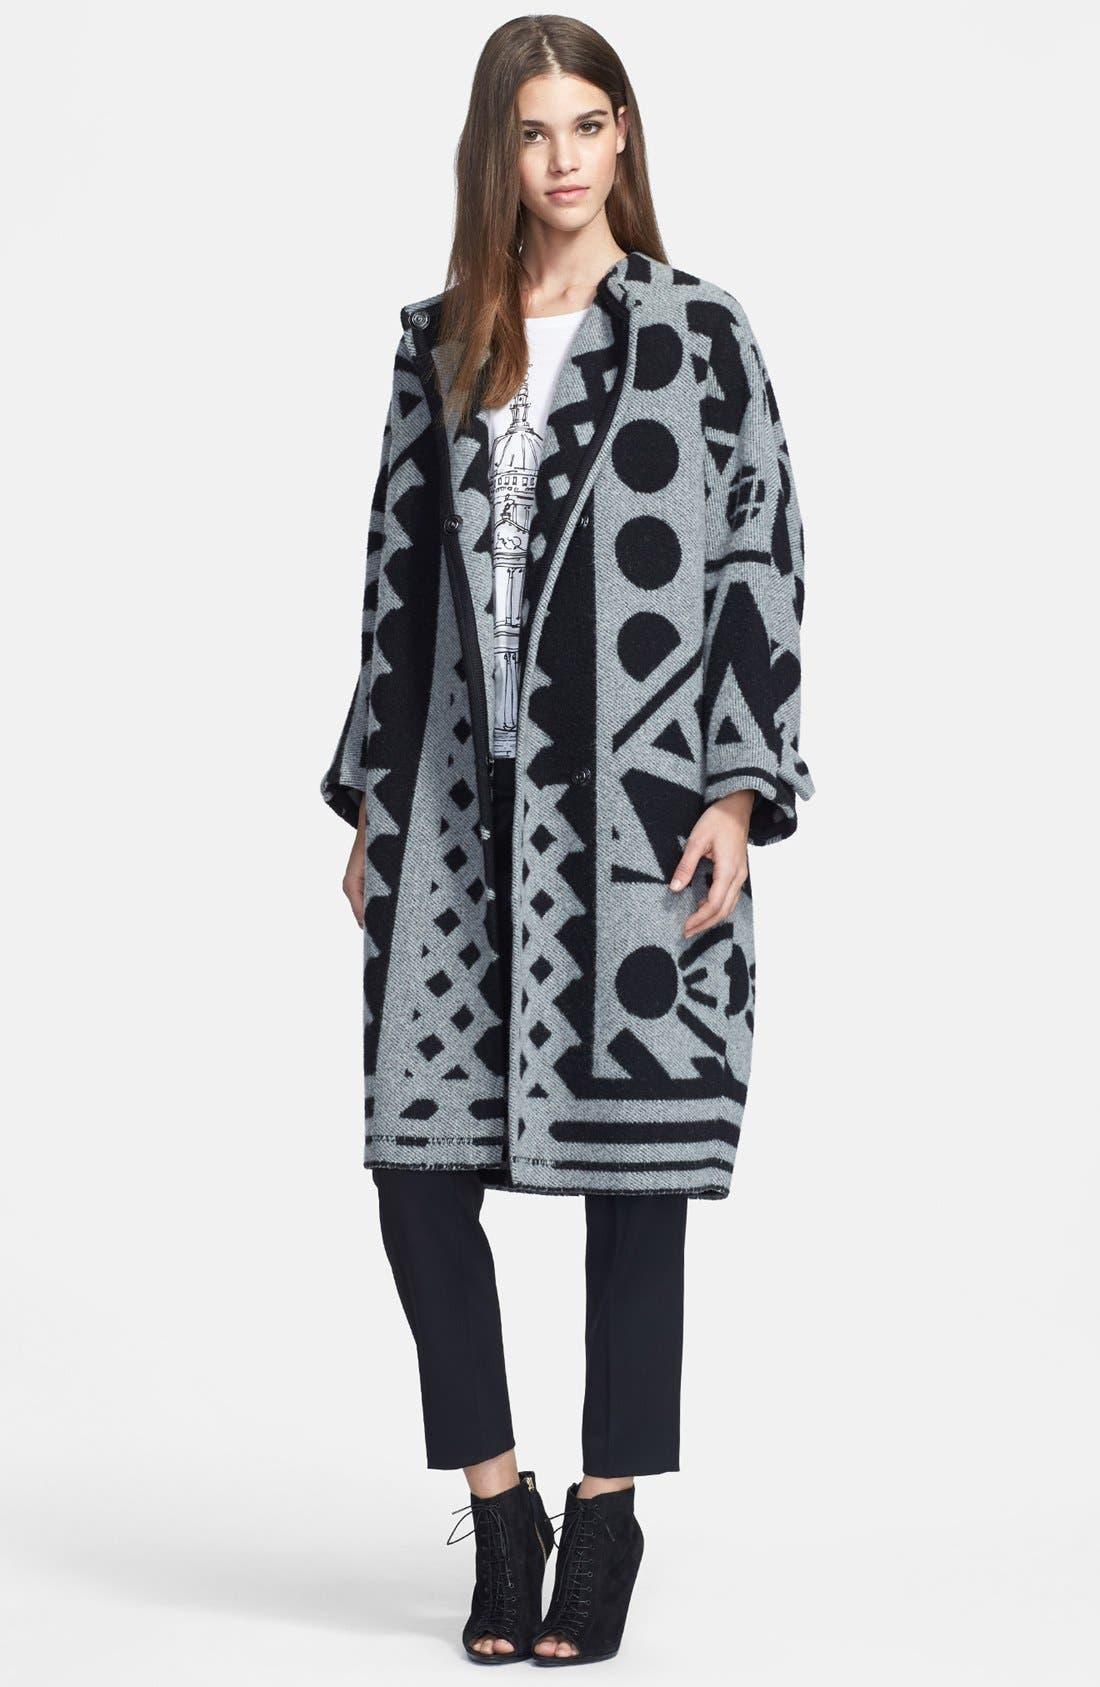 Main Image - Burberry Prorsum Jacquard Wool & Cashmere Blanket Coat